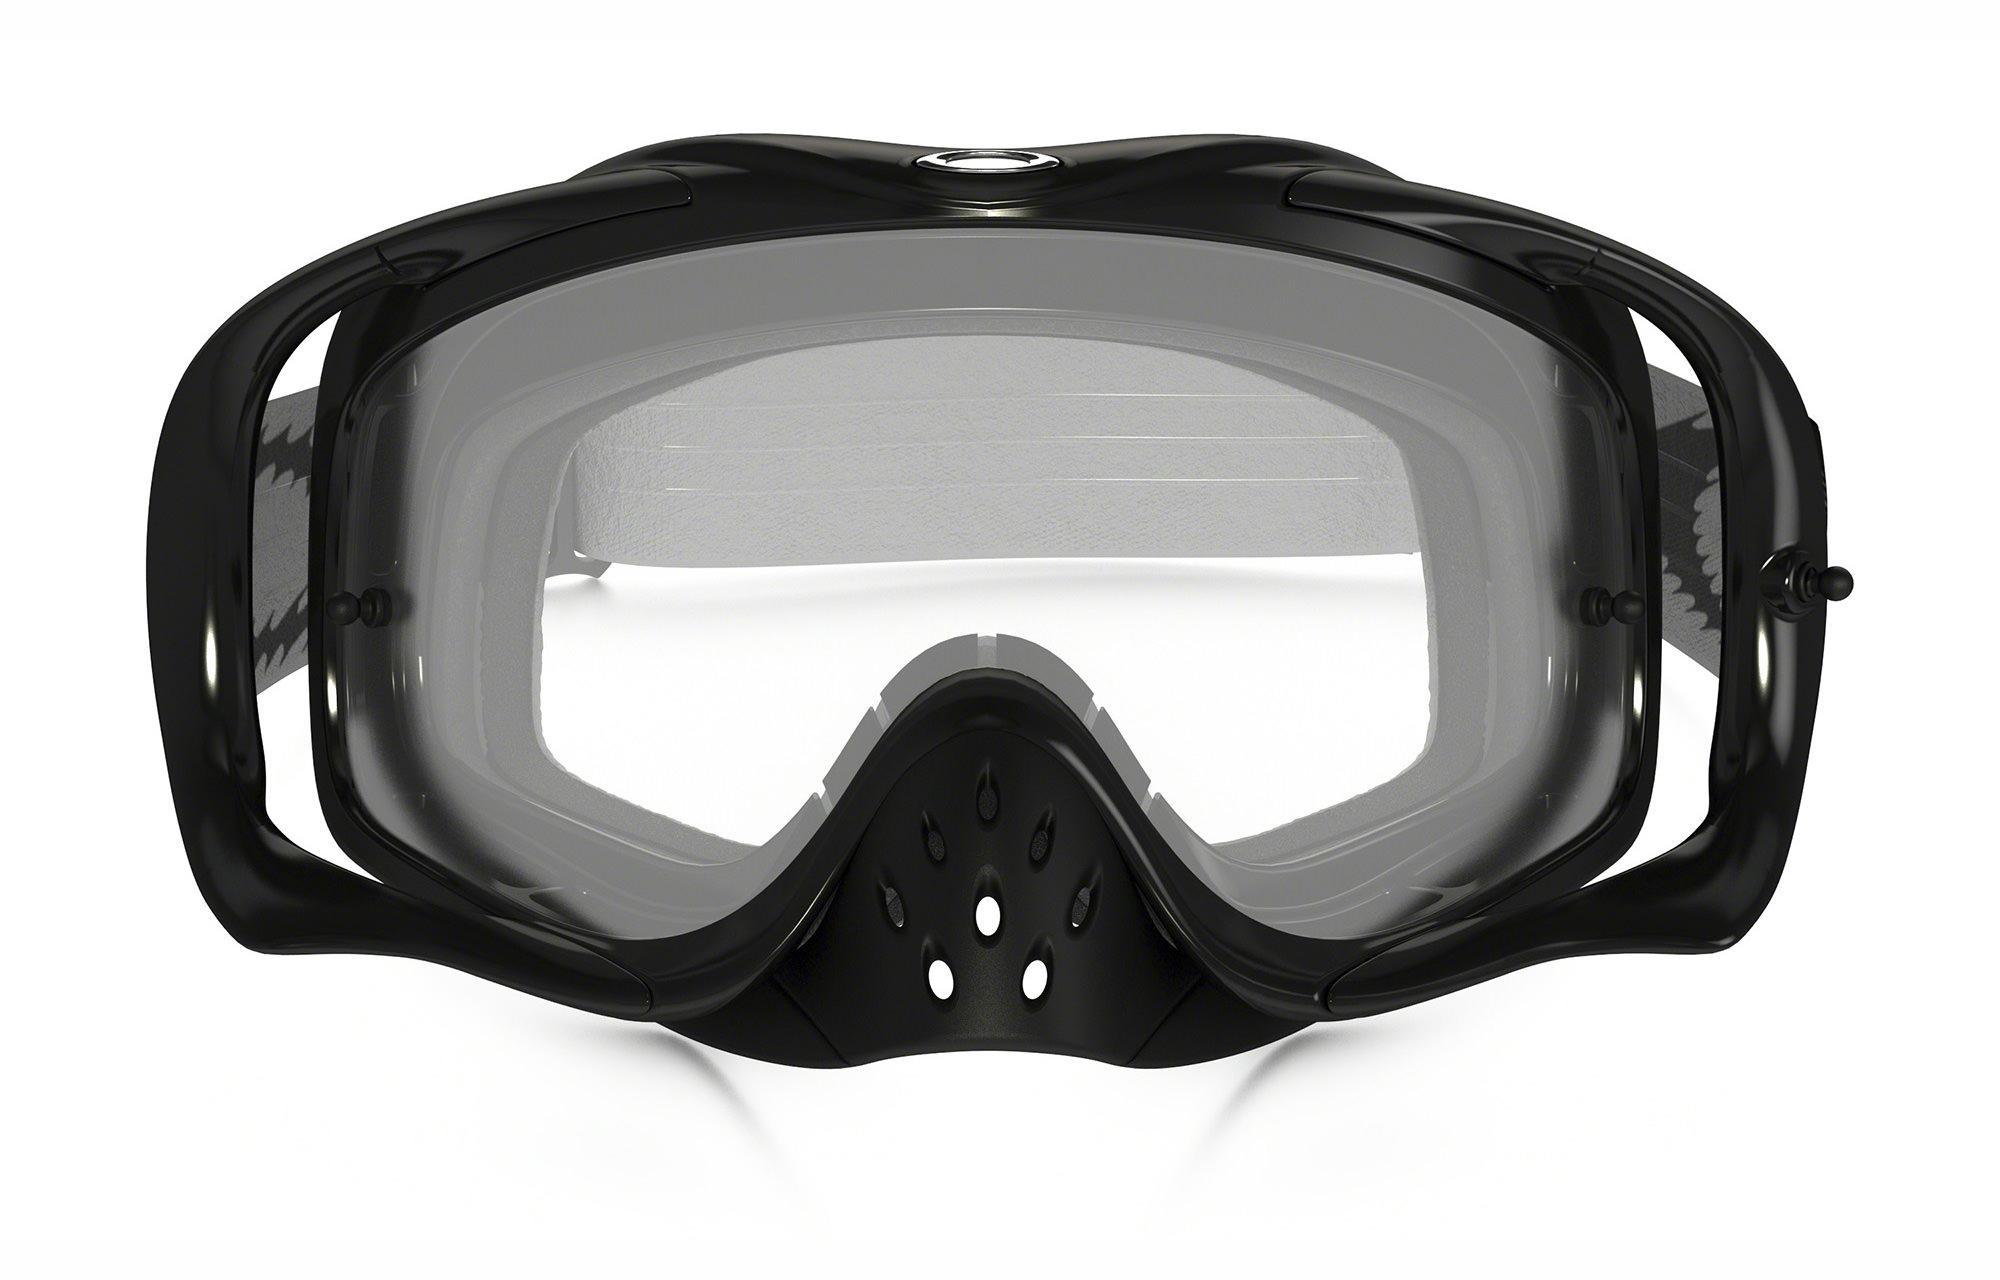 298f373409 Oakley Crowbar Mx Goggles Clear Lens « Heritage Malta